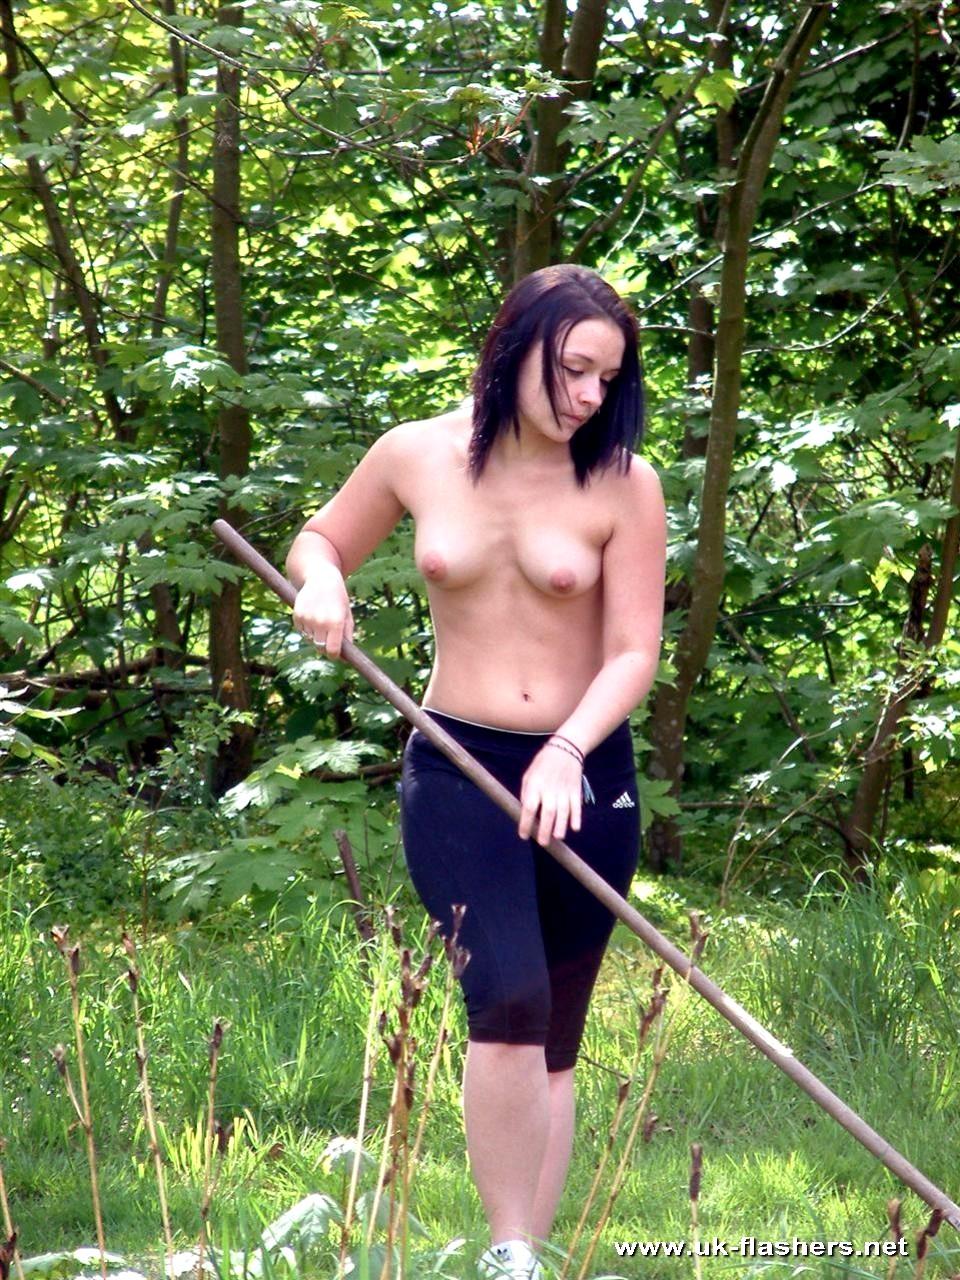 Nude Women Gardening